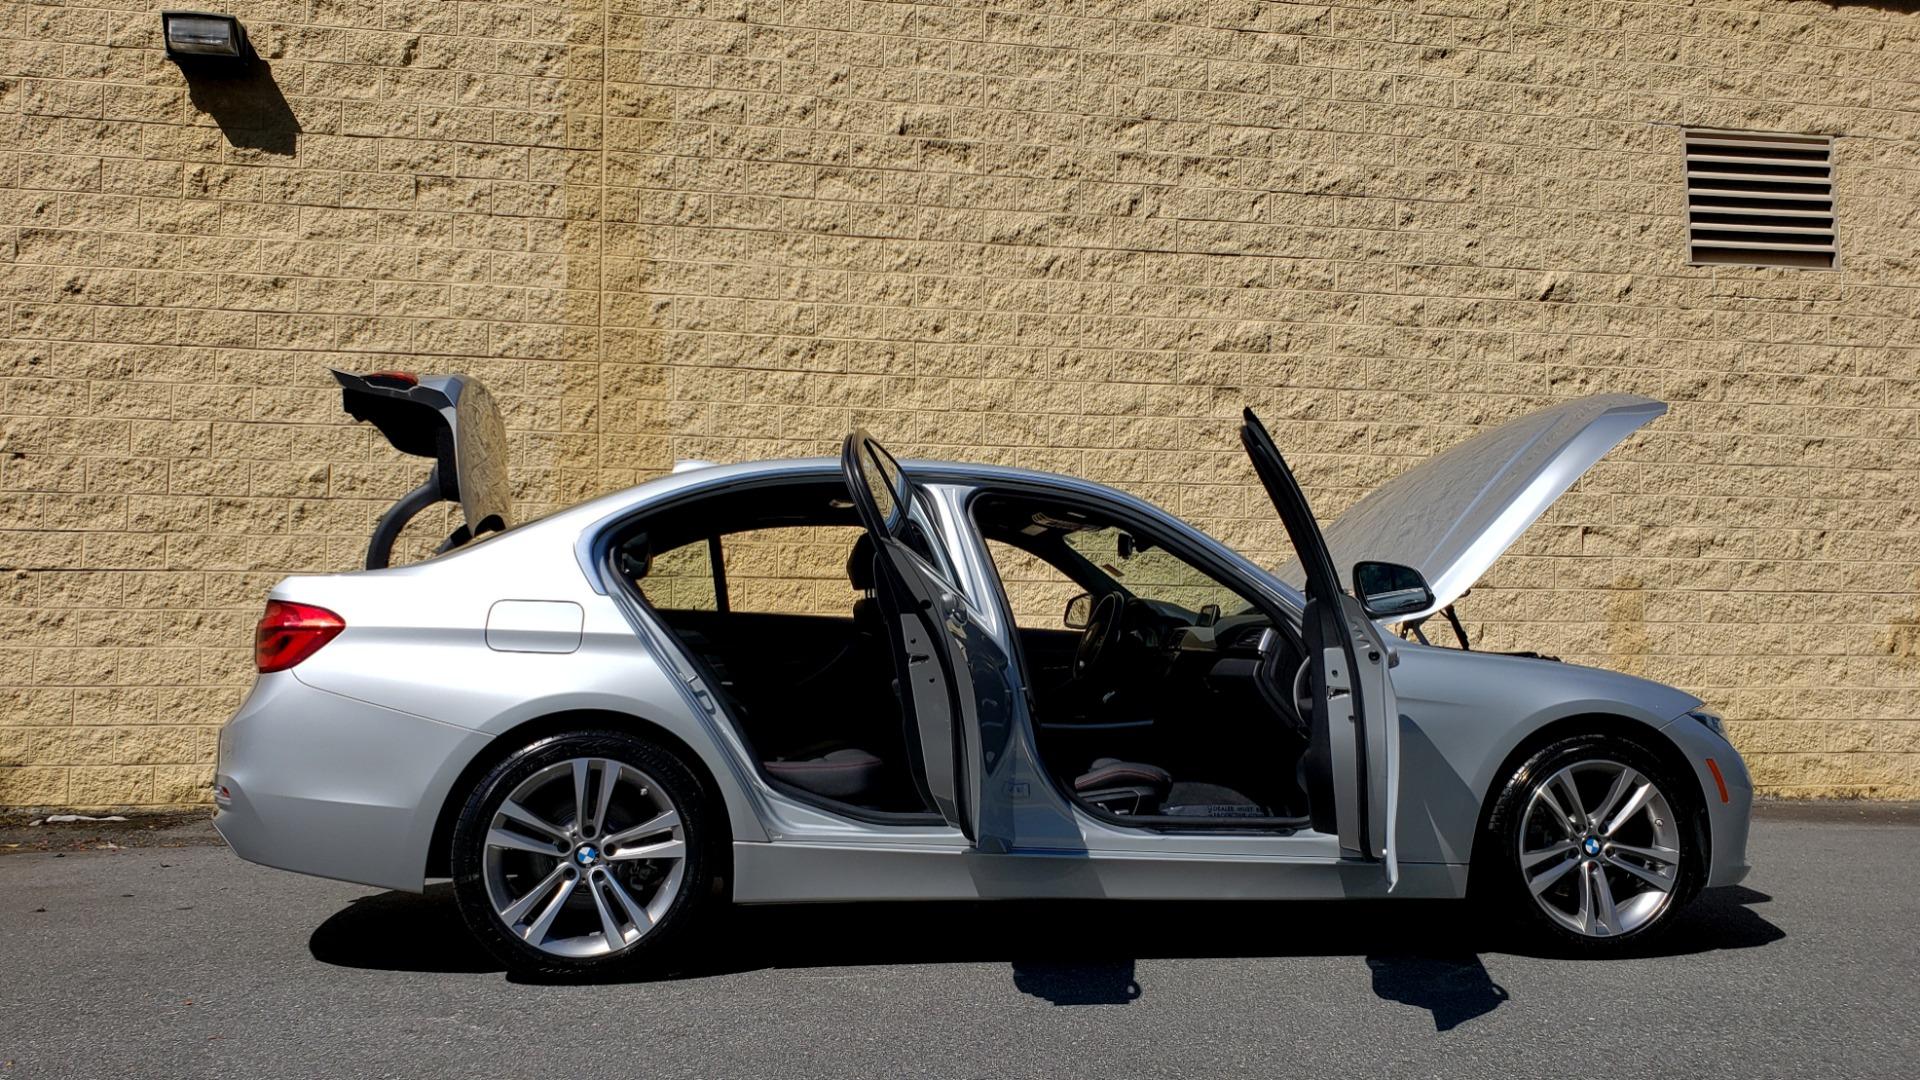 Used 2017 BMW 3 SERIES 330I SPORT SEDAN / DRVR ASST PKG / SUNROOF / REARVIEW for sale Sold at Formula Imports in Charlotte NC 28227 9